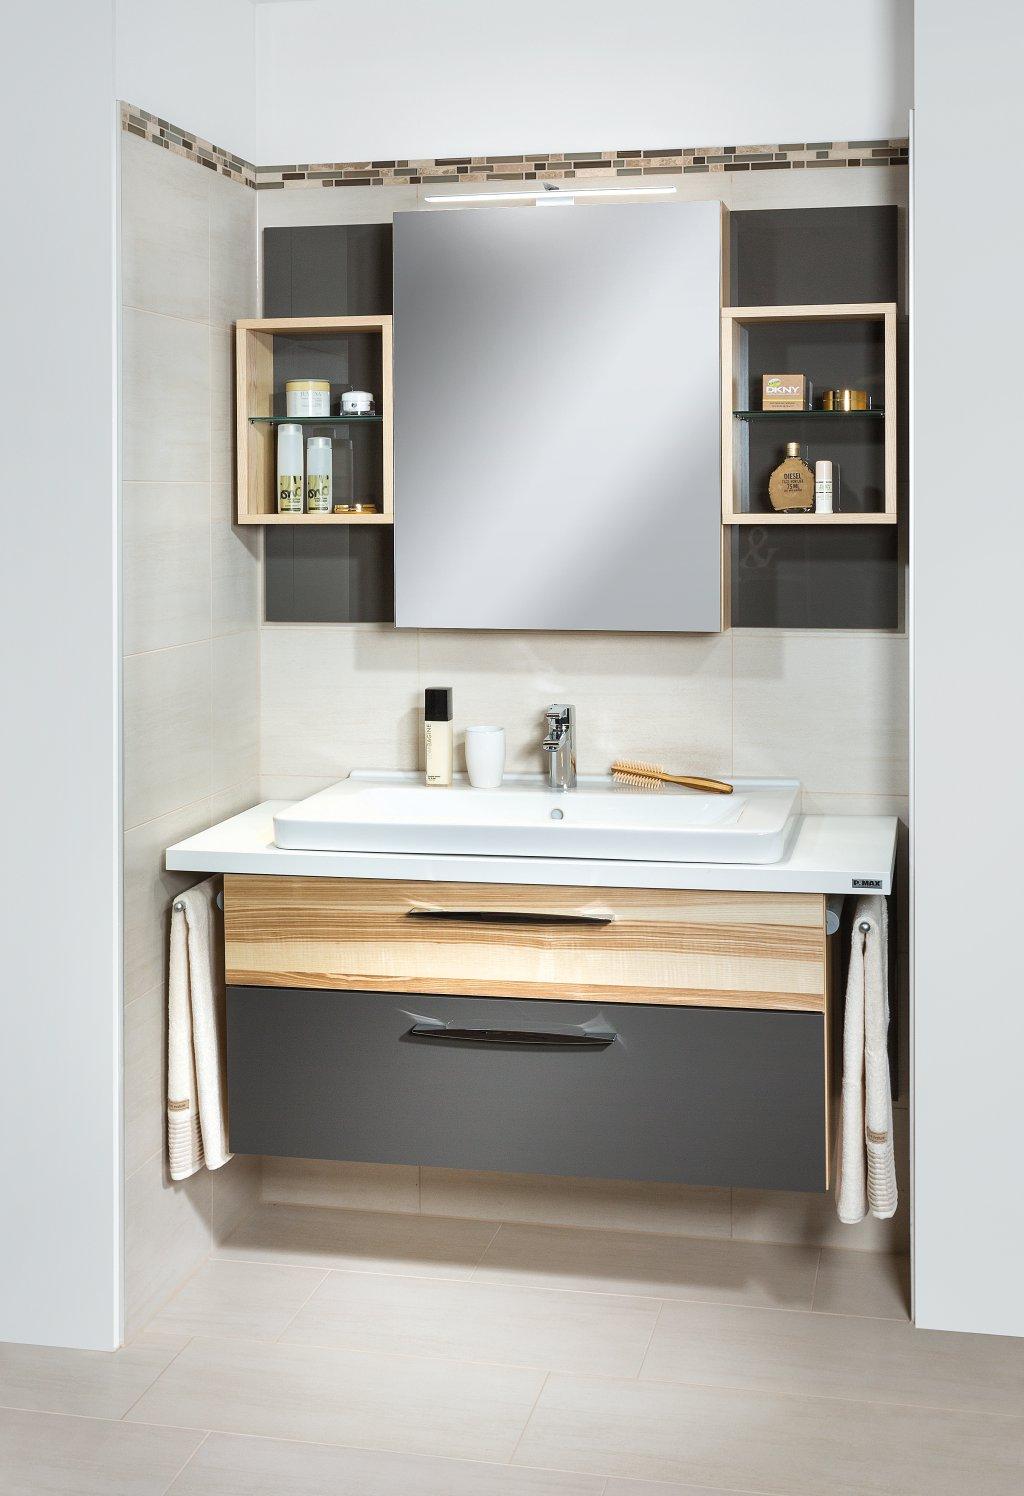 planungsbeispiel max bad 0112 p max ma m bel. Black Bedroom Furniture Sets. Home Design Ideas